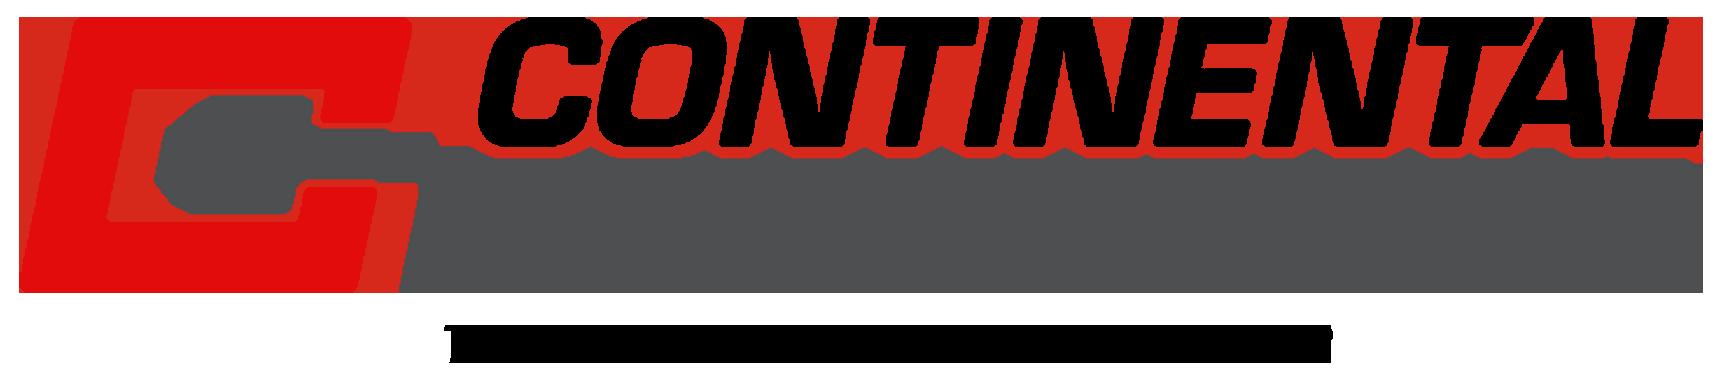 ROB20B-32651-J0